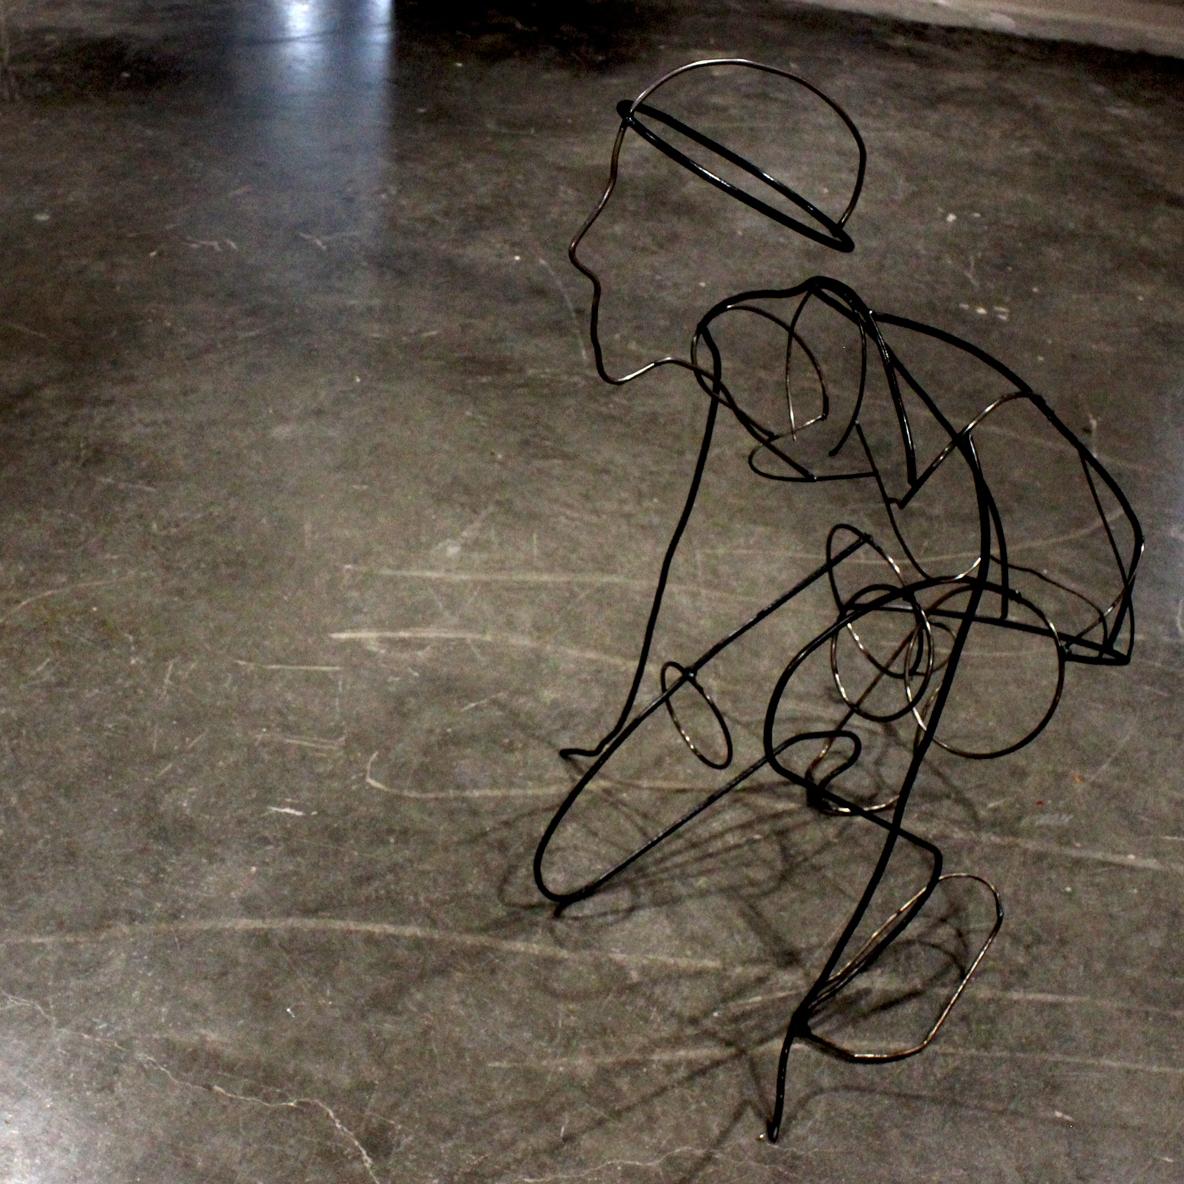 Iron sculpture of a human by Ada Denil 2019